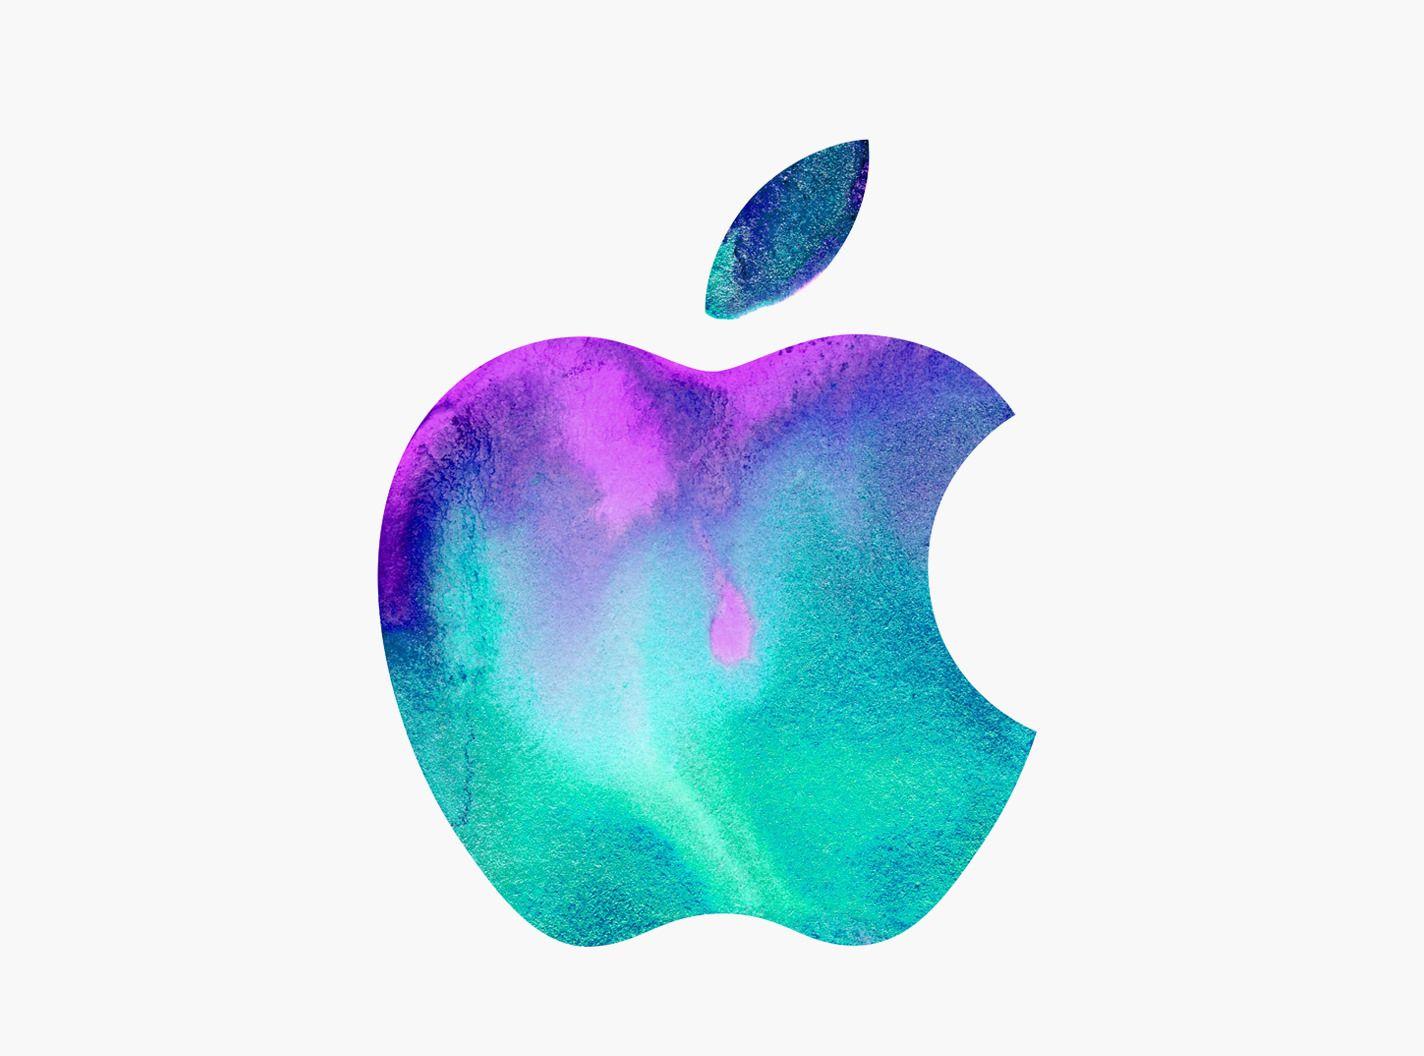 Pin By Andrew Boston On Apple Logos Apple Logo Design Apple Logo Apple